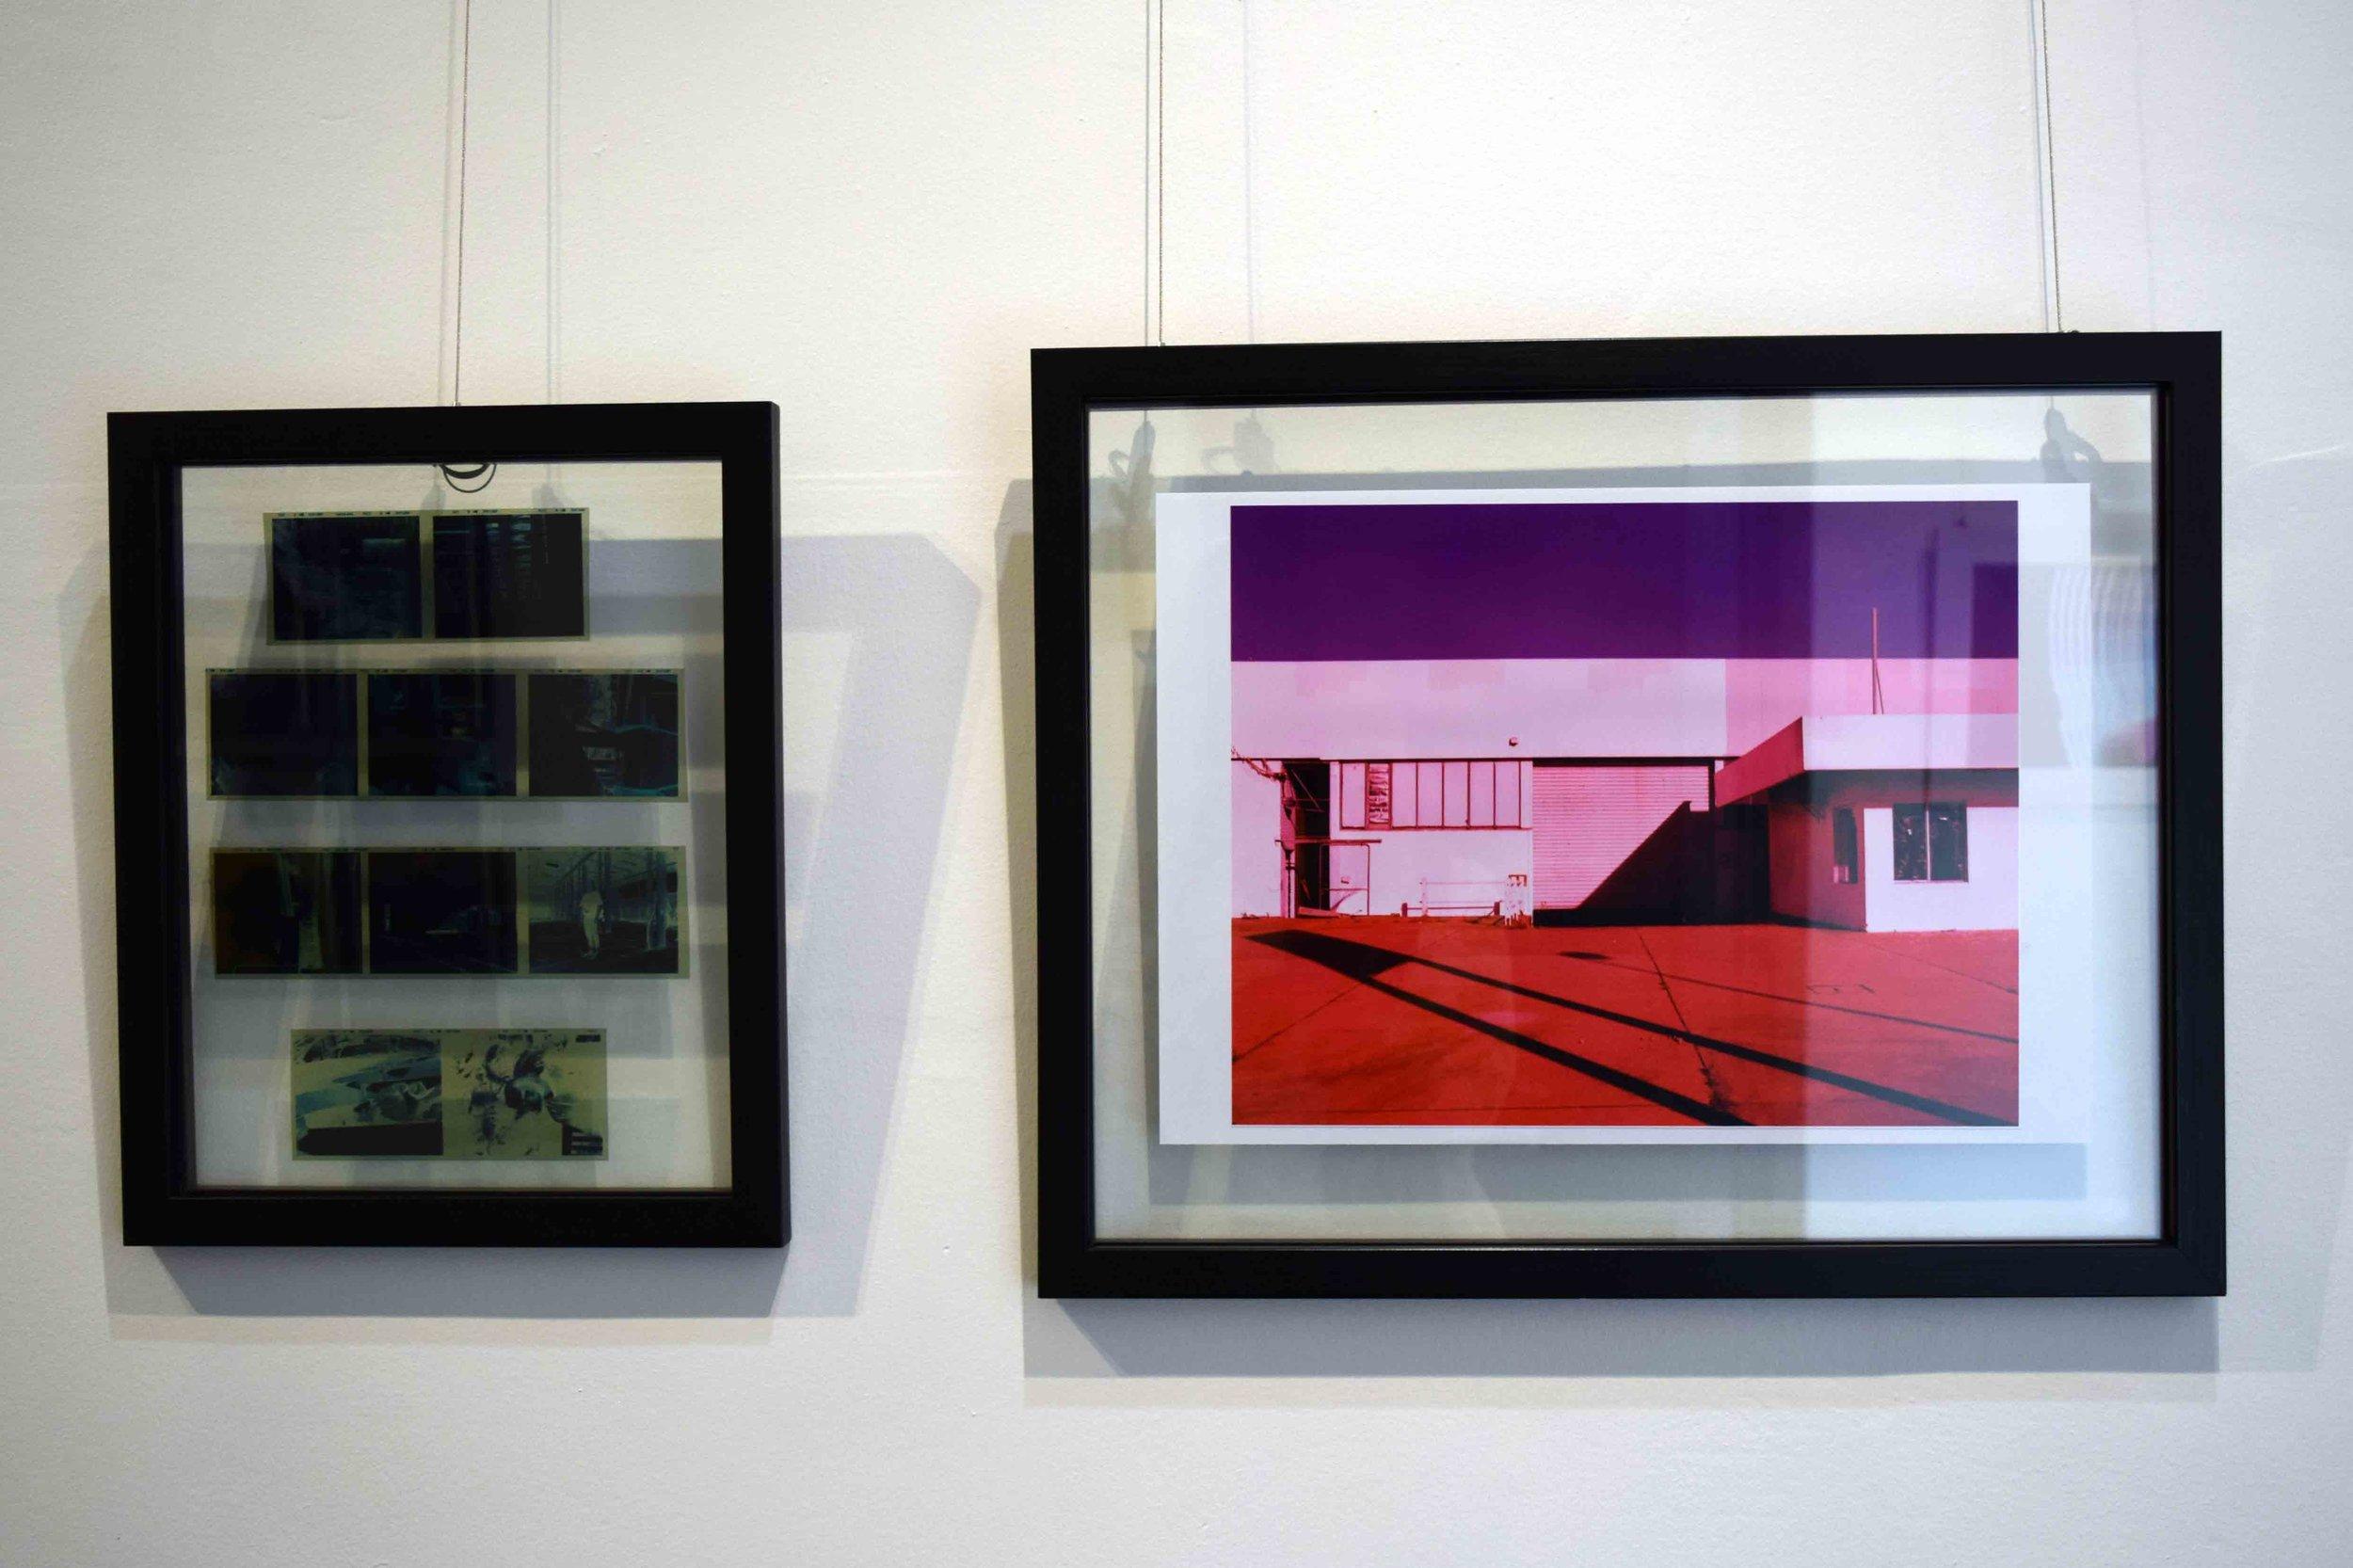 77. Levii Harrington,  Cross,  cross-processed anaalogue photograph and film negatives, 34 x 26 cm, 35 x 27.5 cm $95   RUNNER UP - PHOTOGRAPHY